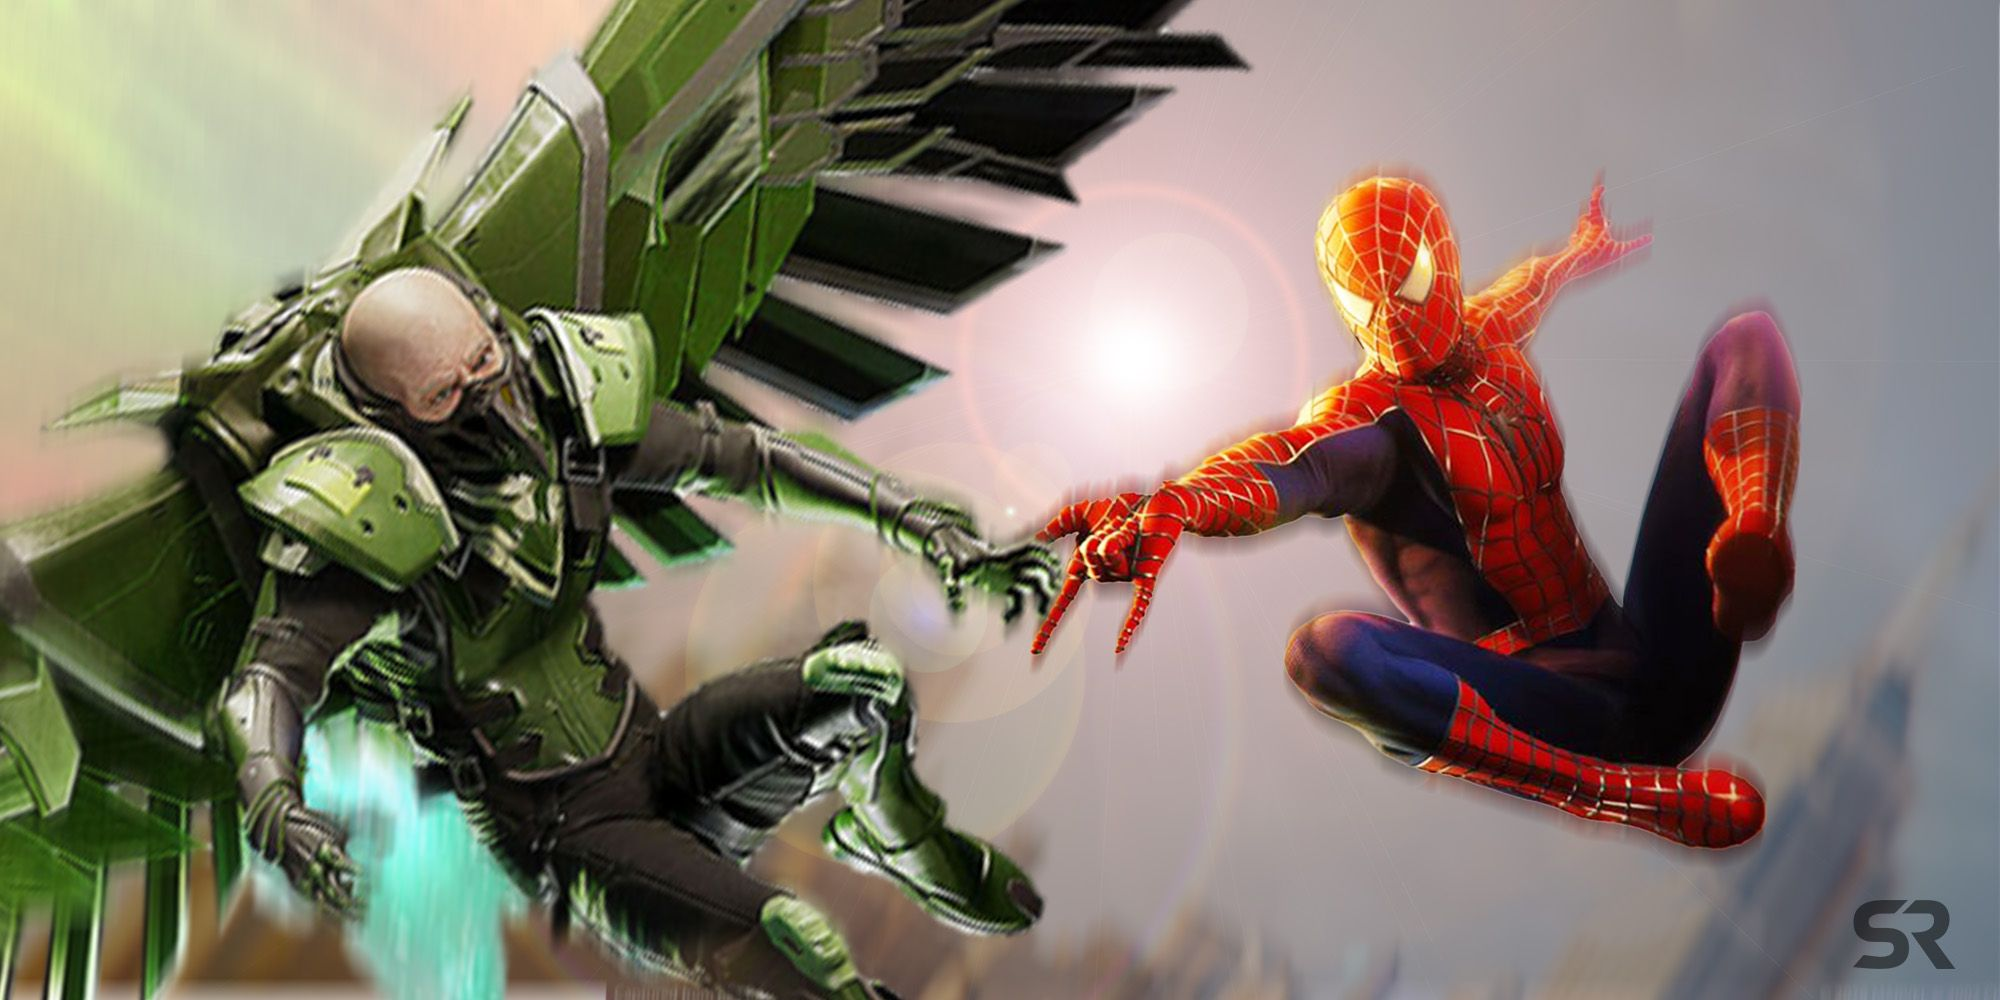 Sam Raimi's Spider-Man 4 Concept Video Shows Battle With Vulture